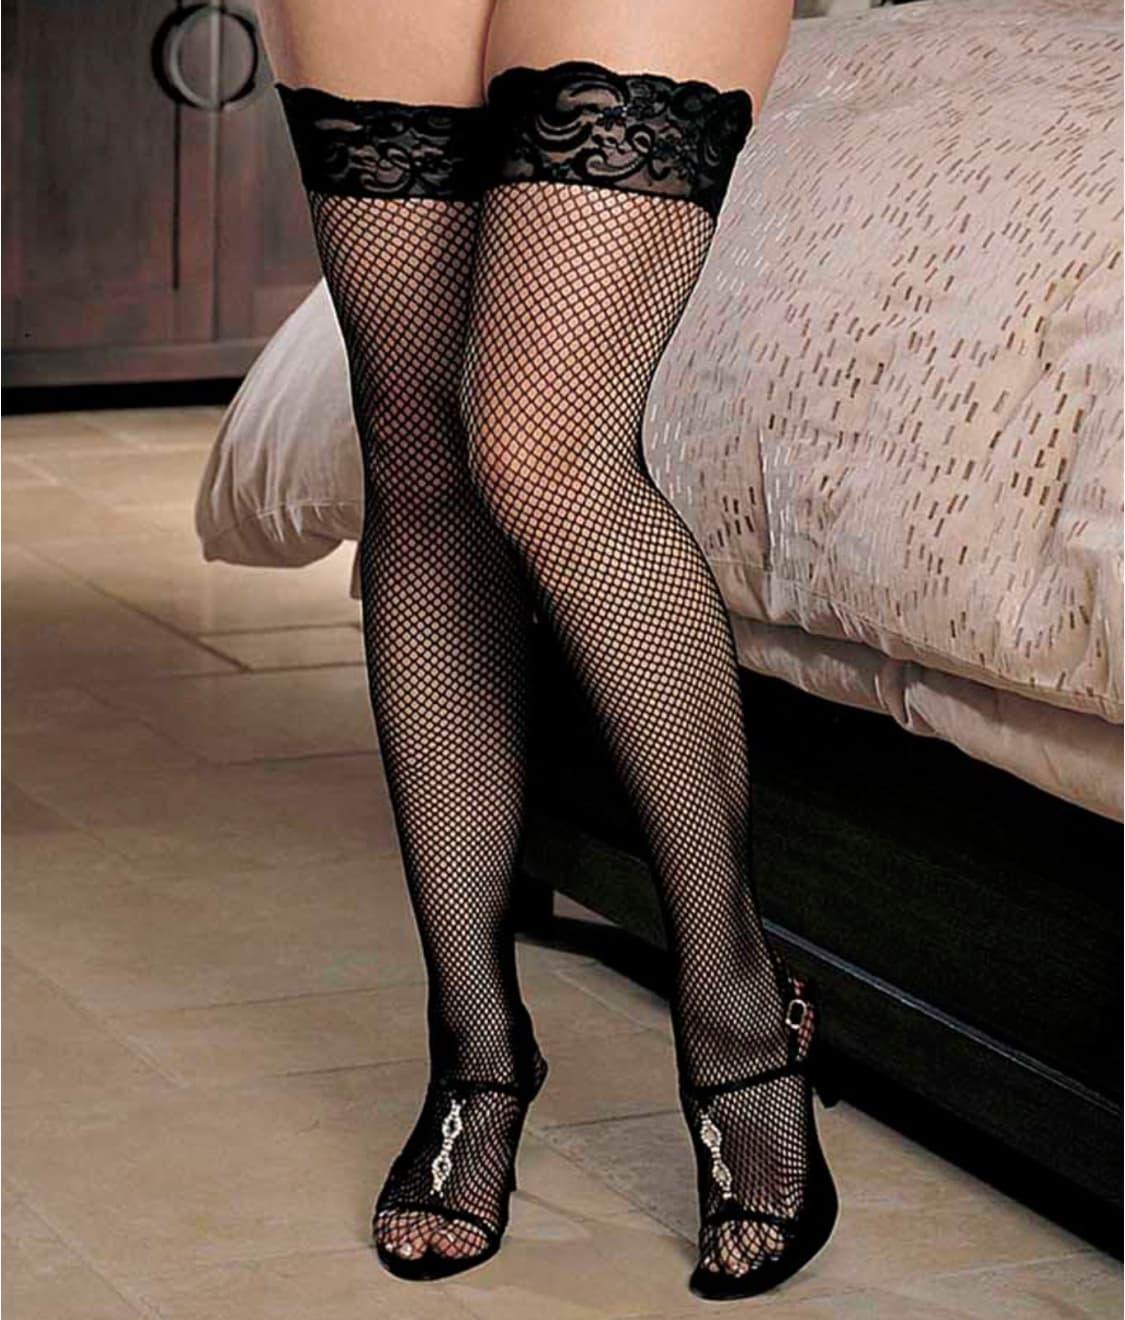 75b6c1dac72 Shirley of Hollywood Plus Size Fishnet Back Seam Thigh High